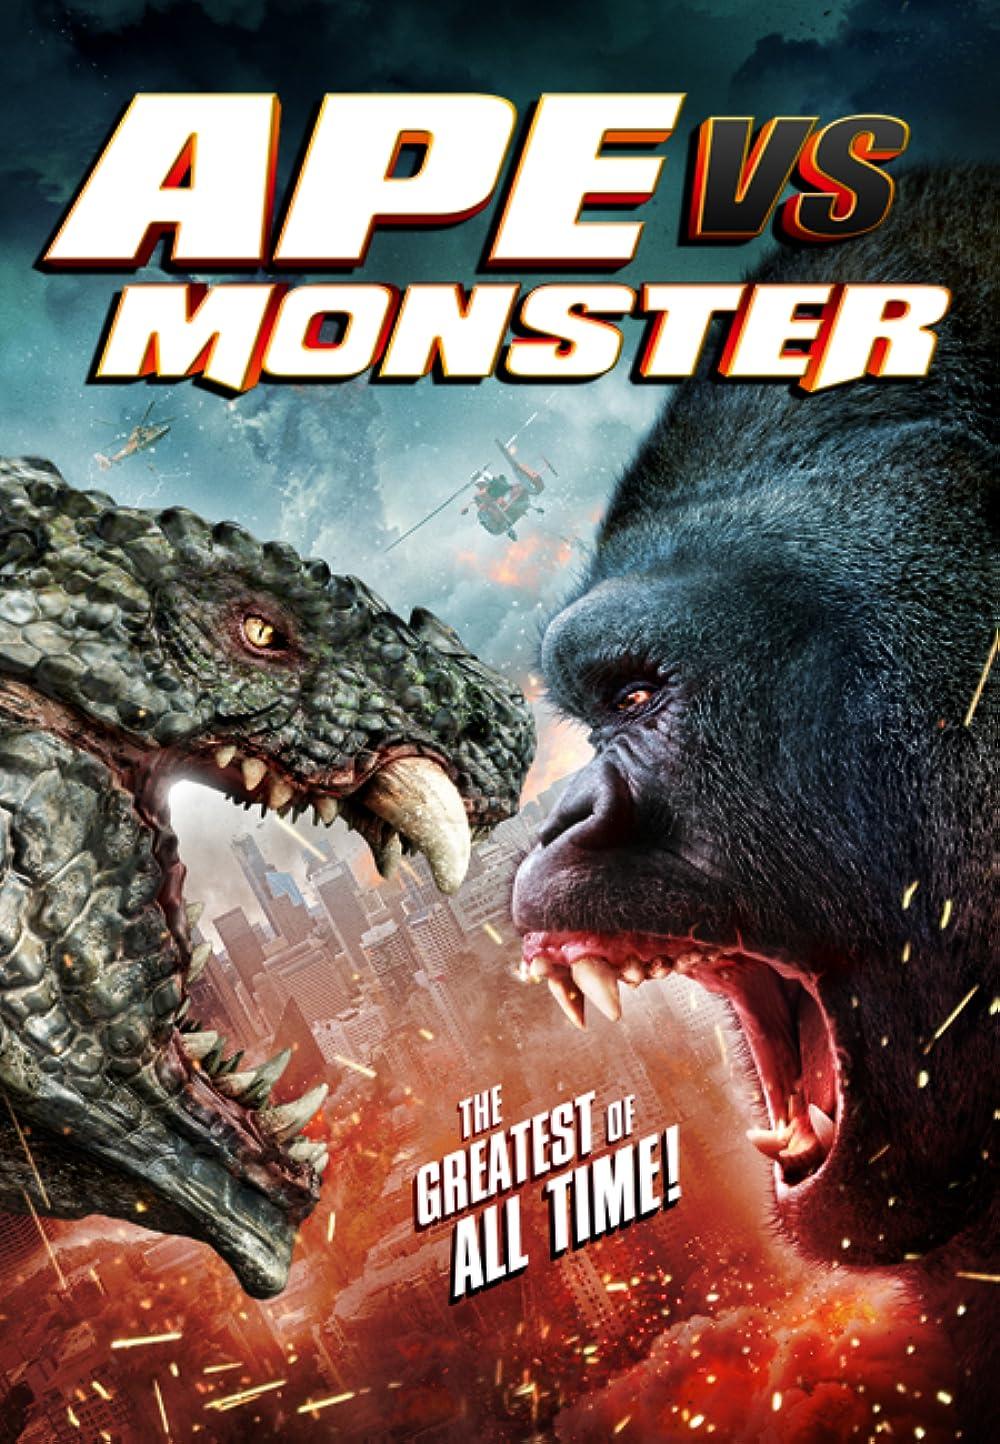 Ape vs. Monster 2021 English 1080p HDRip ESubs 1.4GB Download